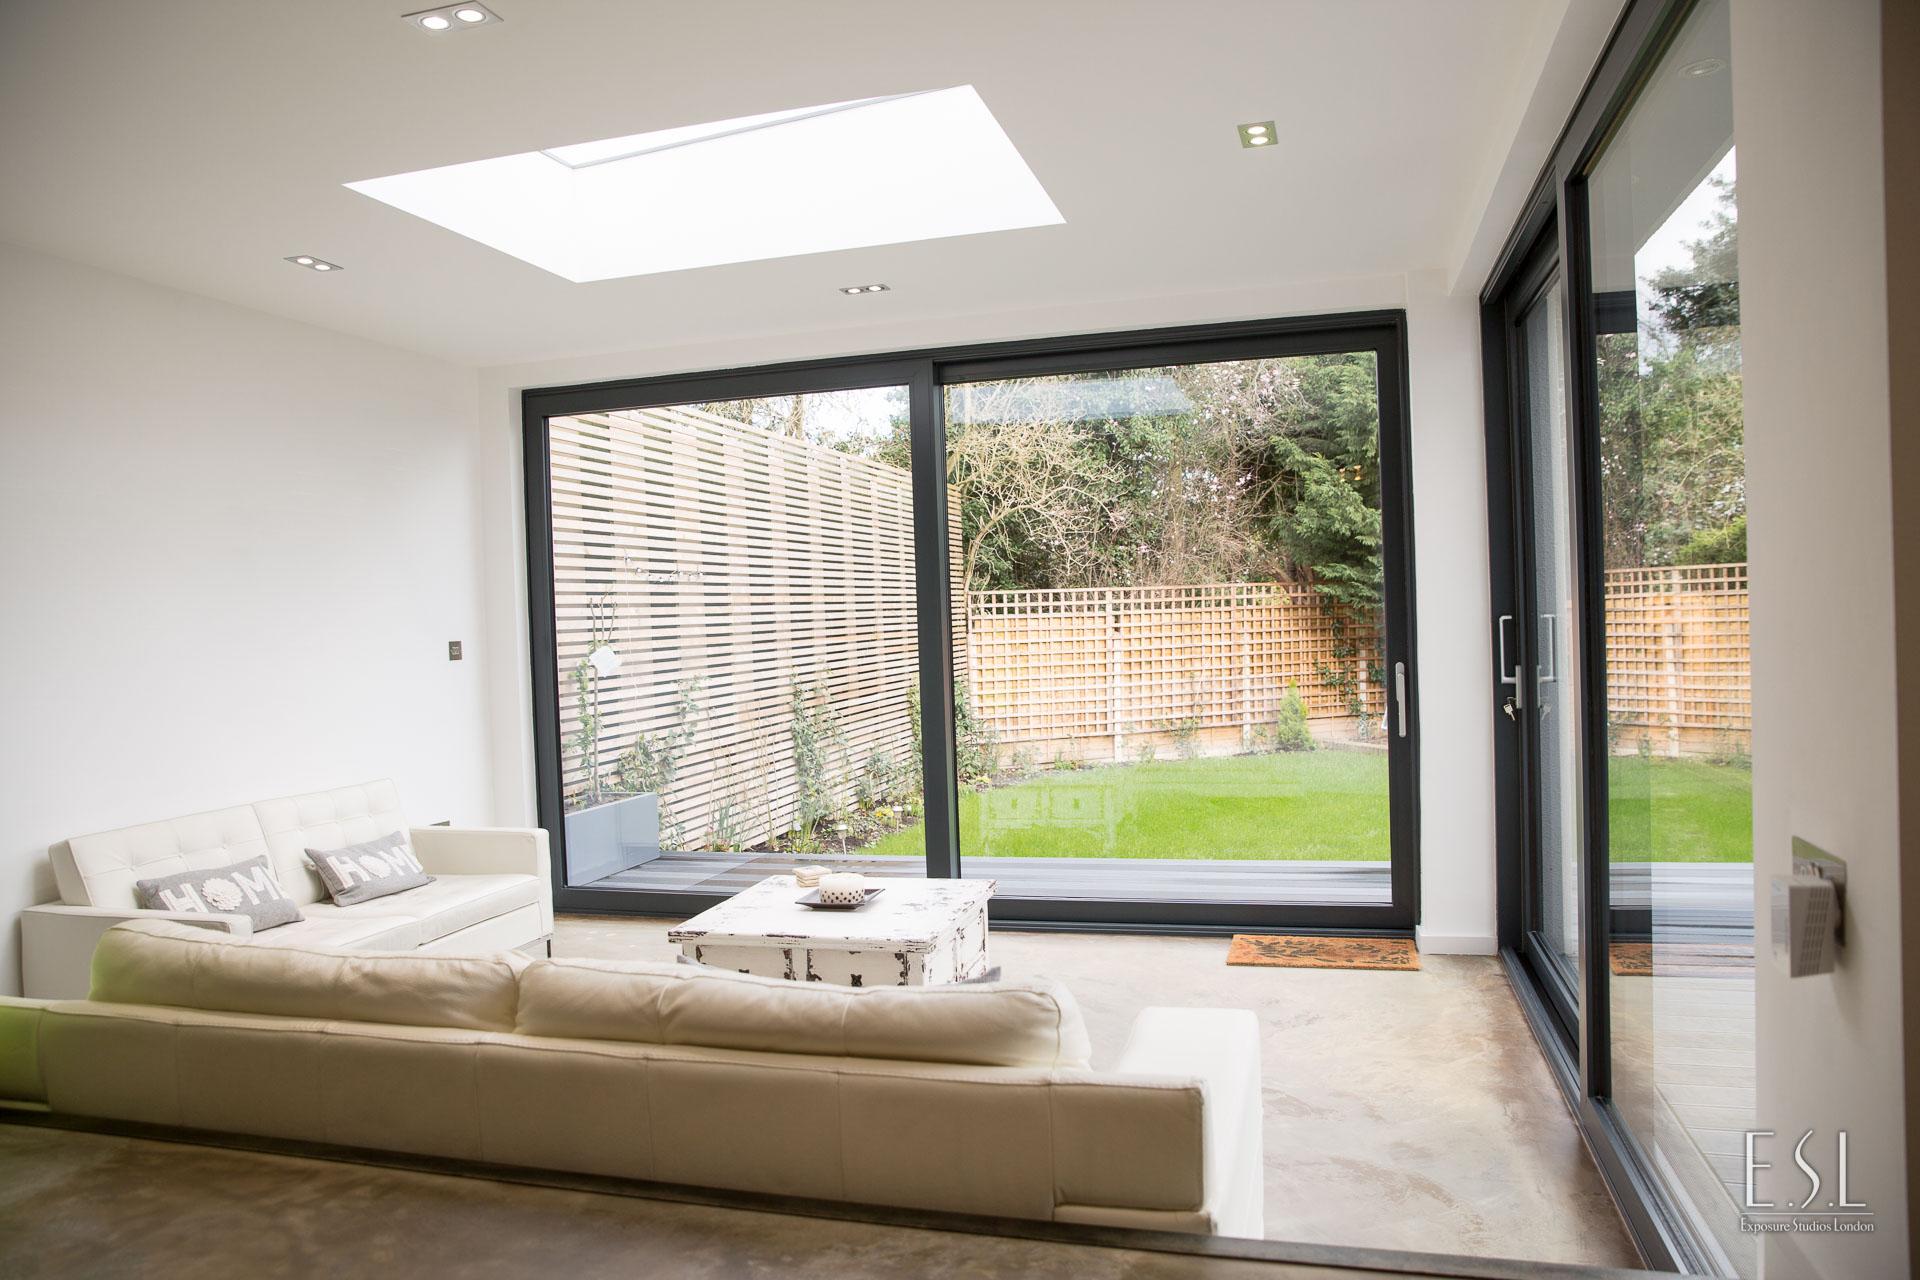 Bilders, Winchmore Hill, London House rennovation & Refurbishment 21